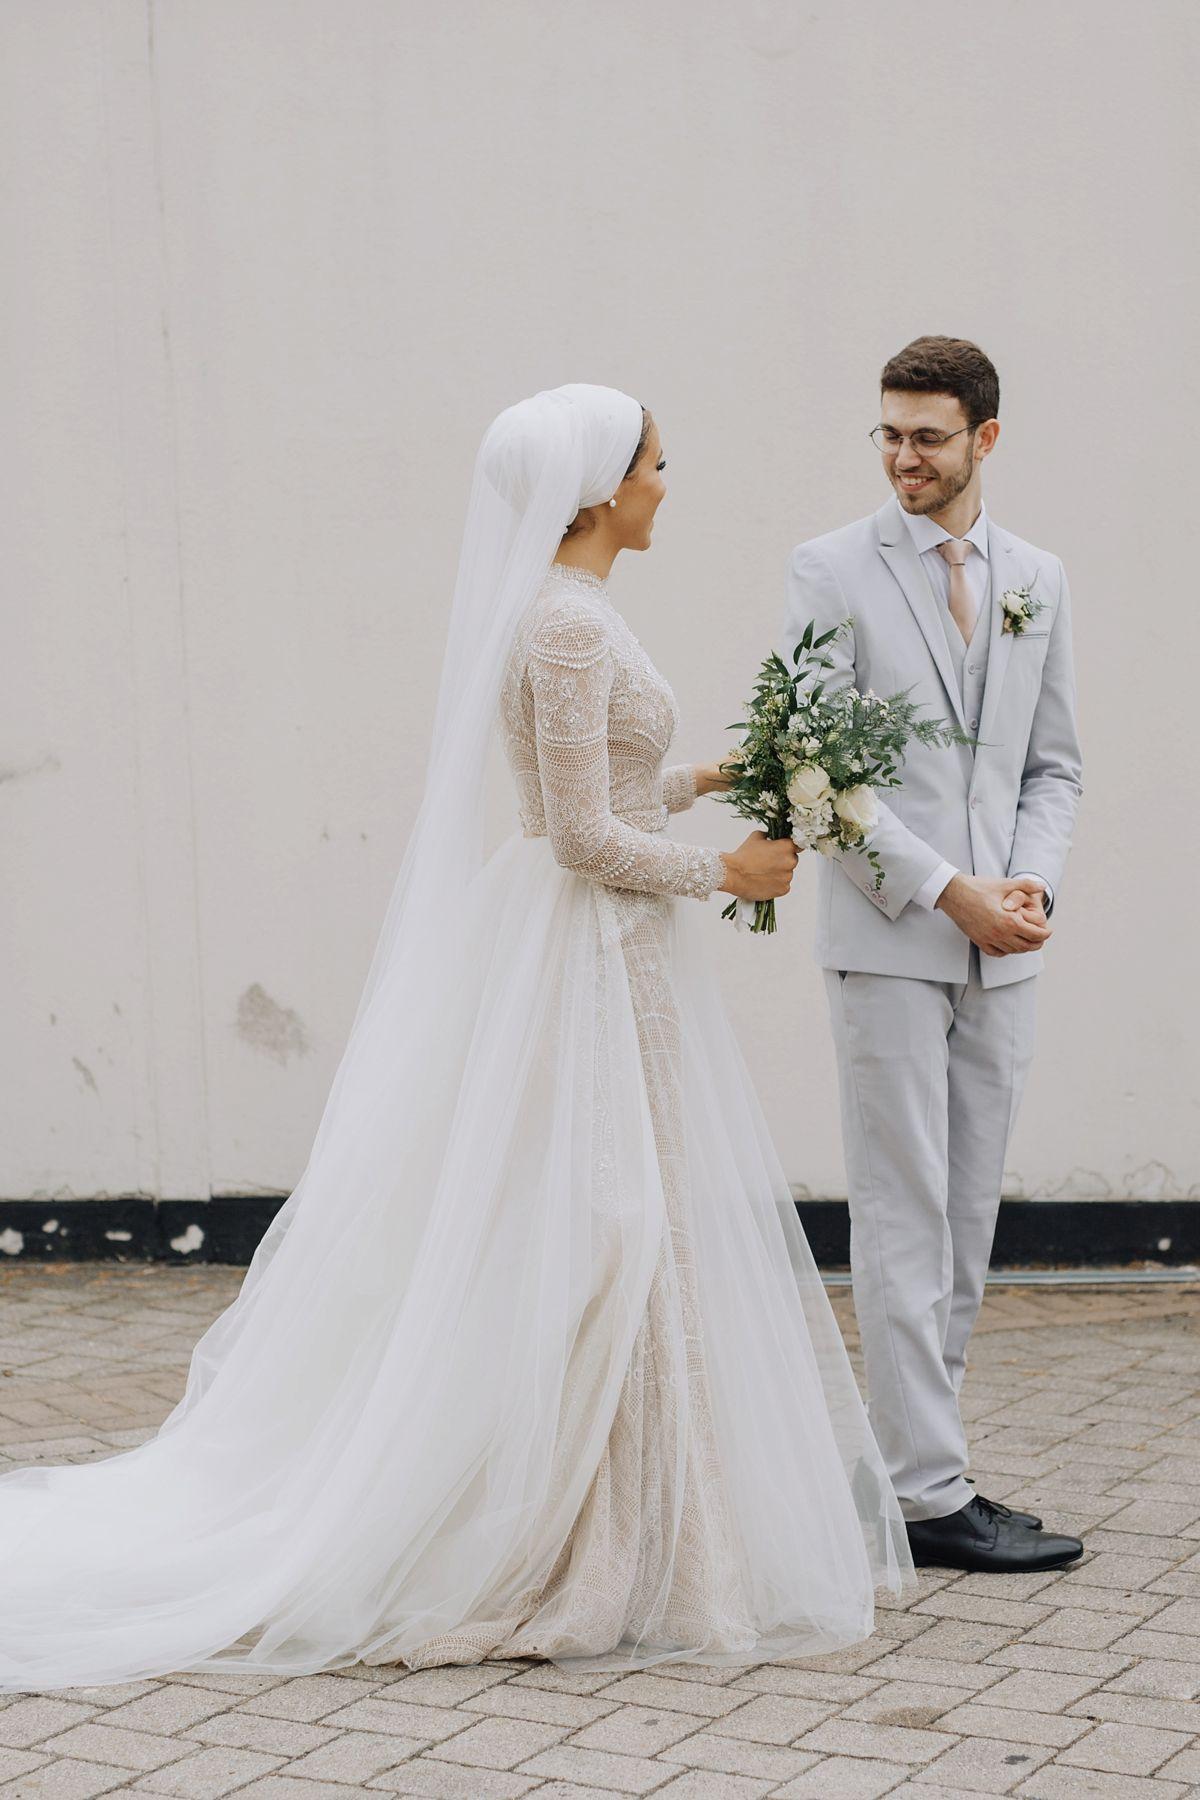 An Ersa Atelier Gown, Humara Waiza Hijab + First Look For Modern Multicultural Wedding in London